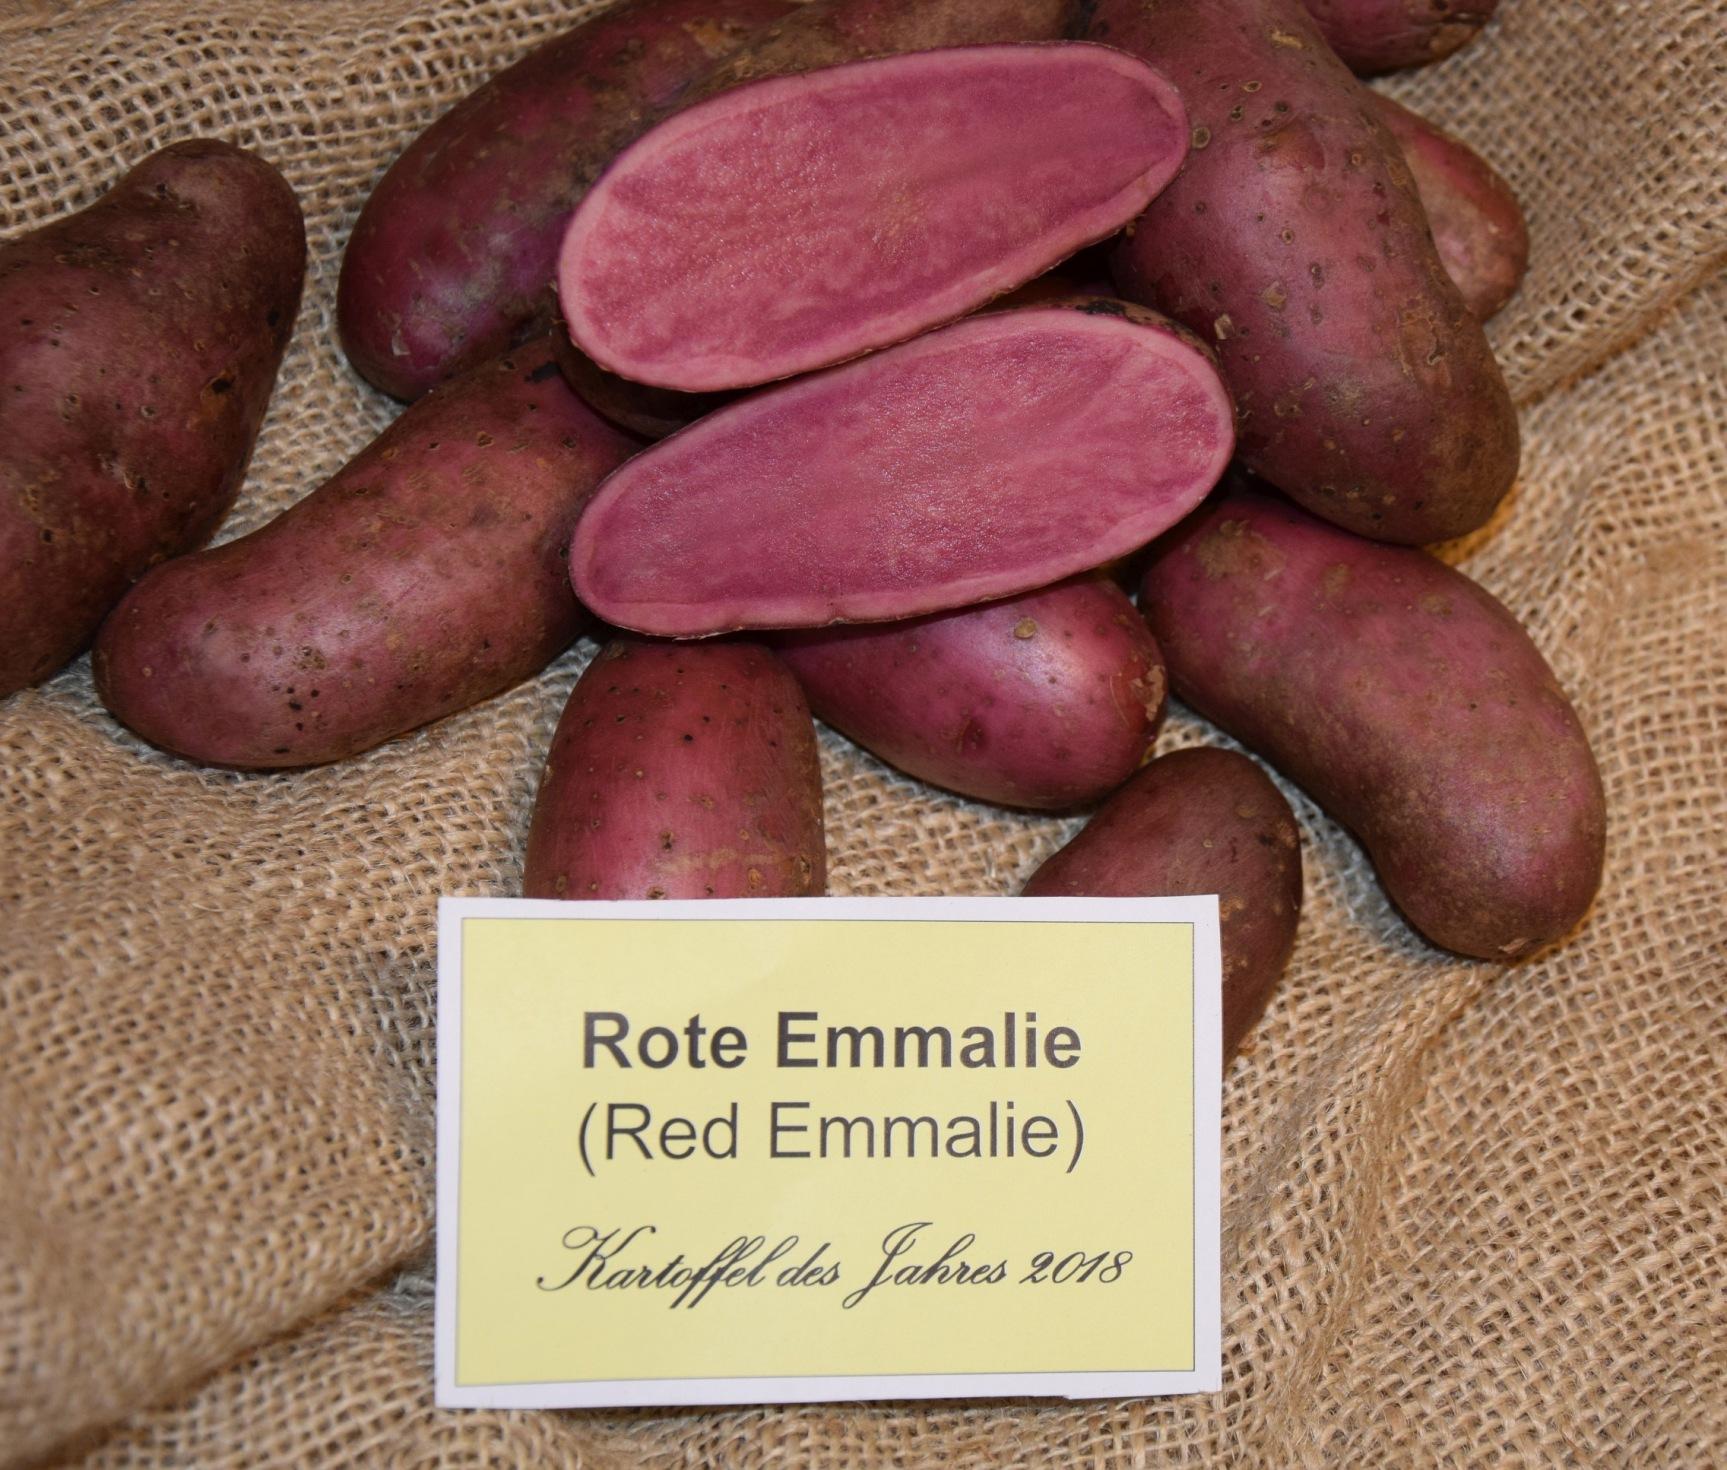 Rote Emmalie Wikipedia